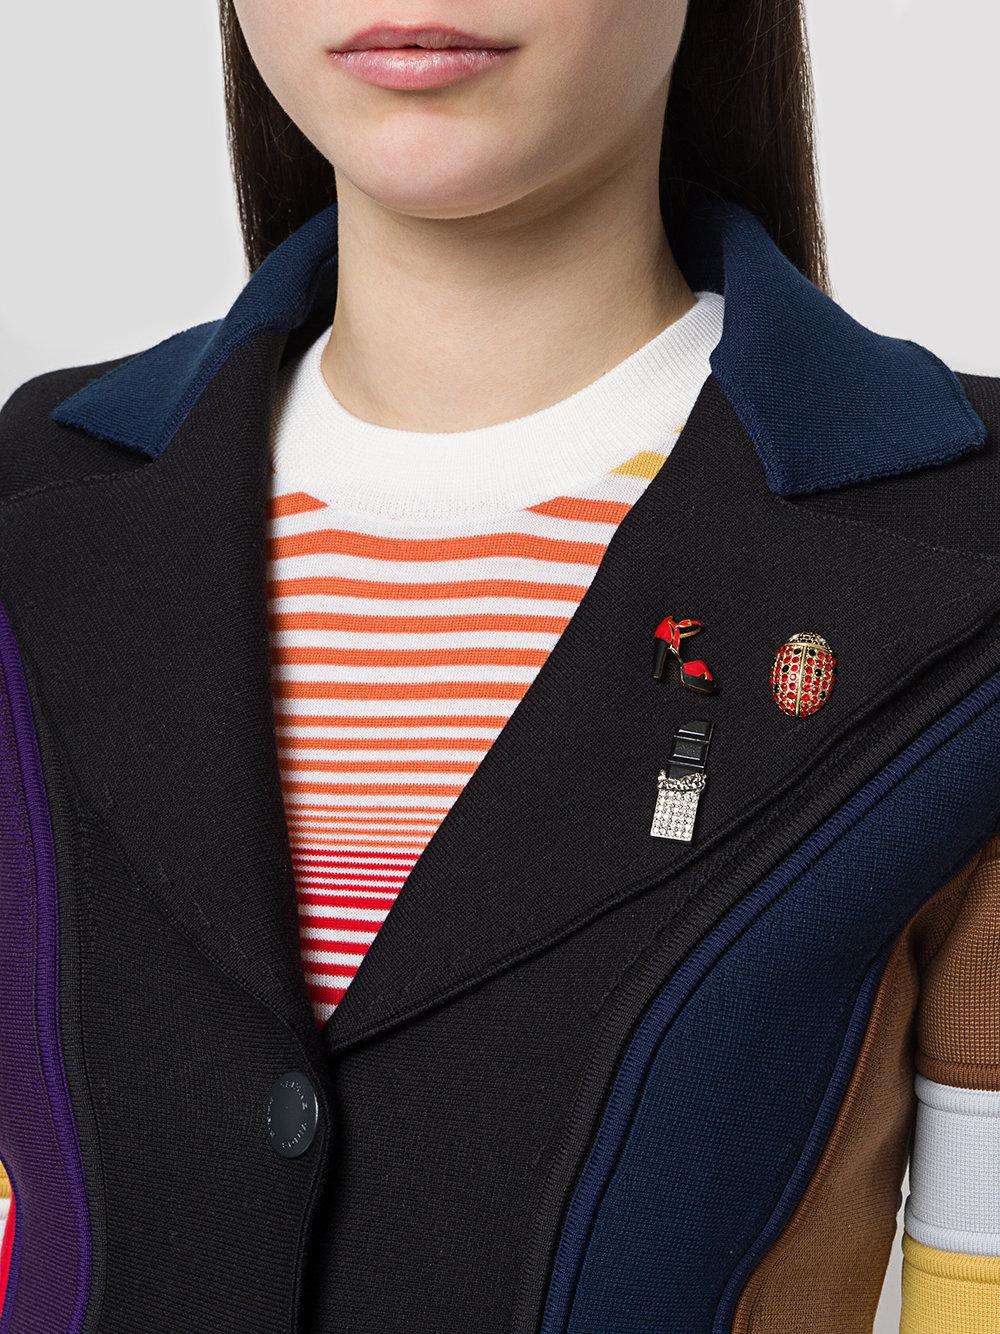 Sonia Rykiel rhinestone ladybird pin - Metallic OBdi4l3fO